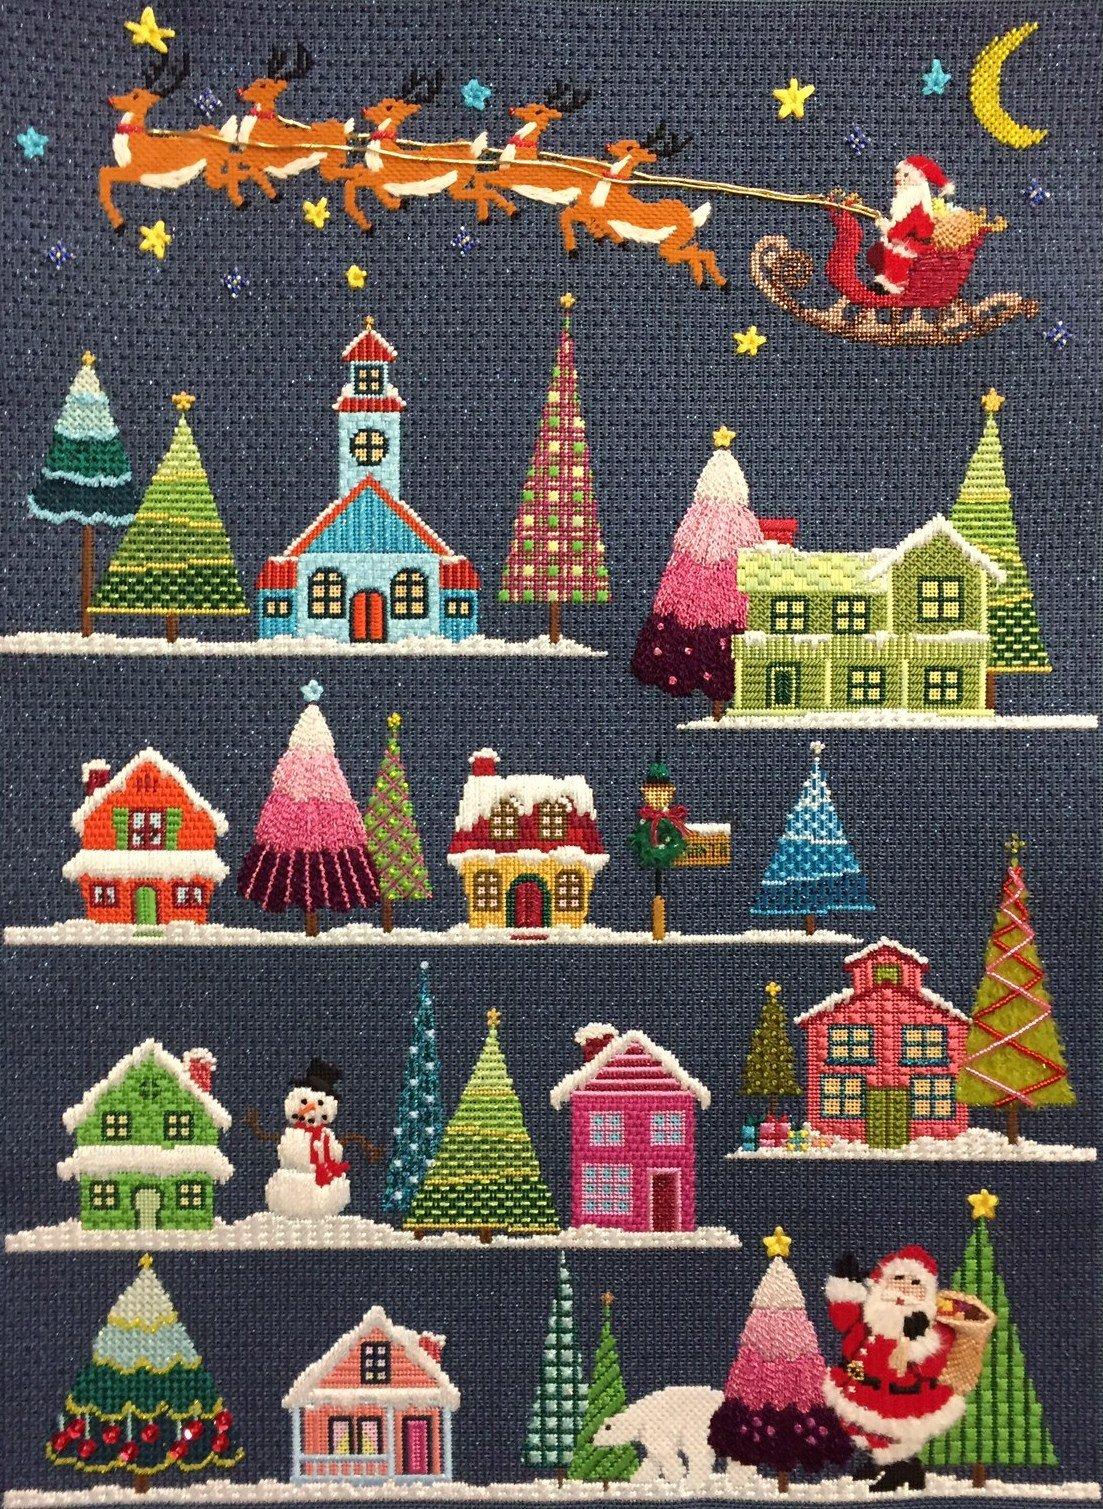 ASIT202 SG Christmas Village Stitch Guide